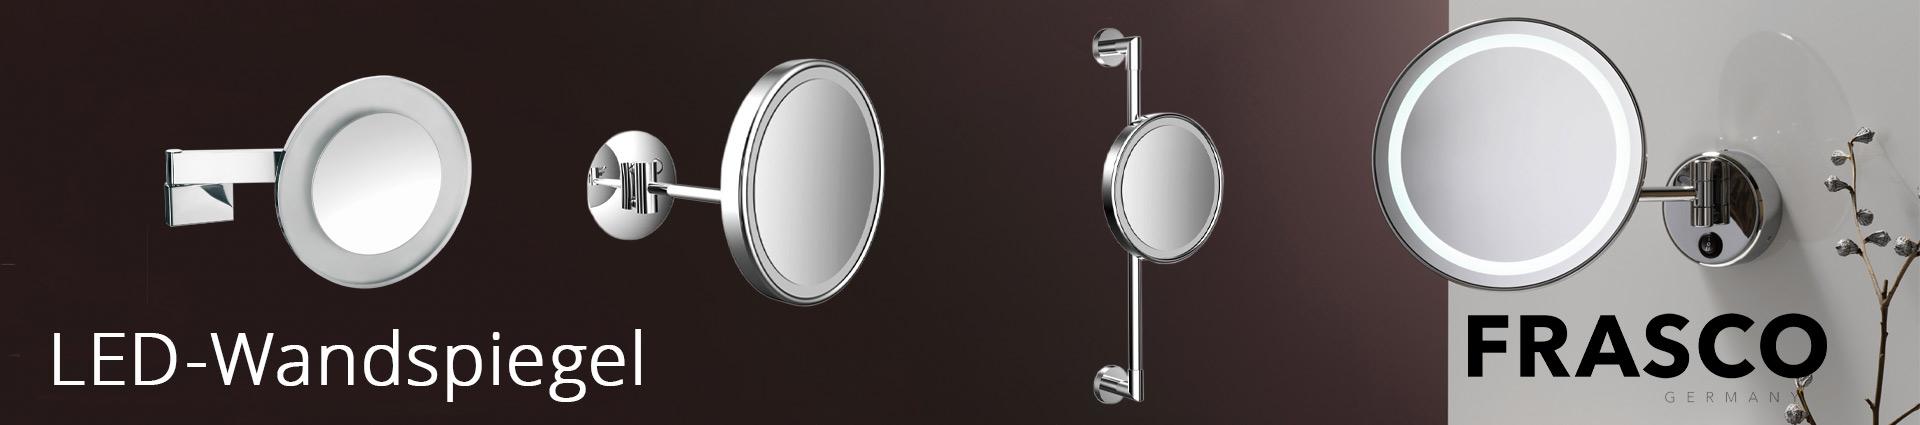 Frasco LED Wandspiegel